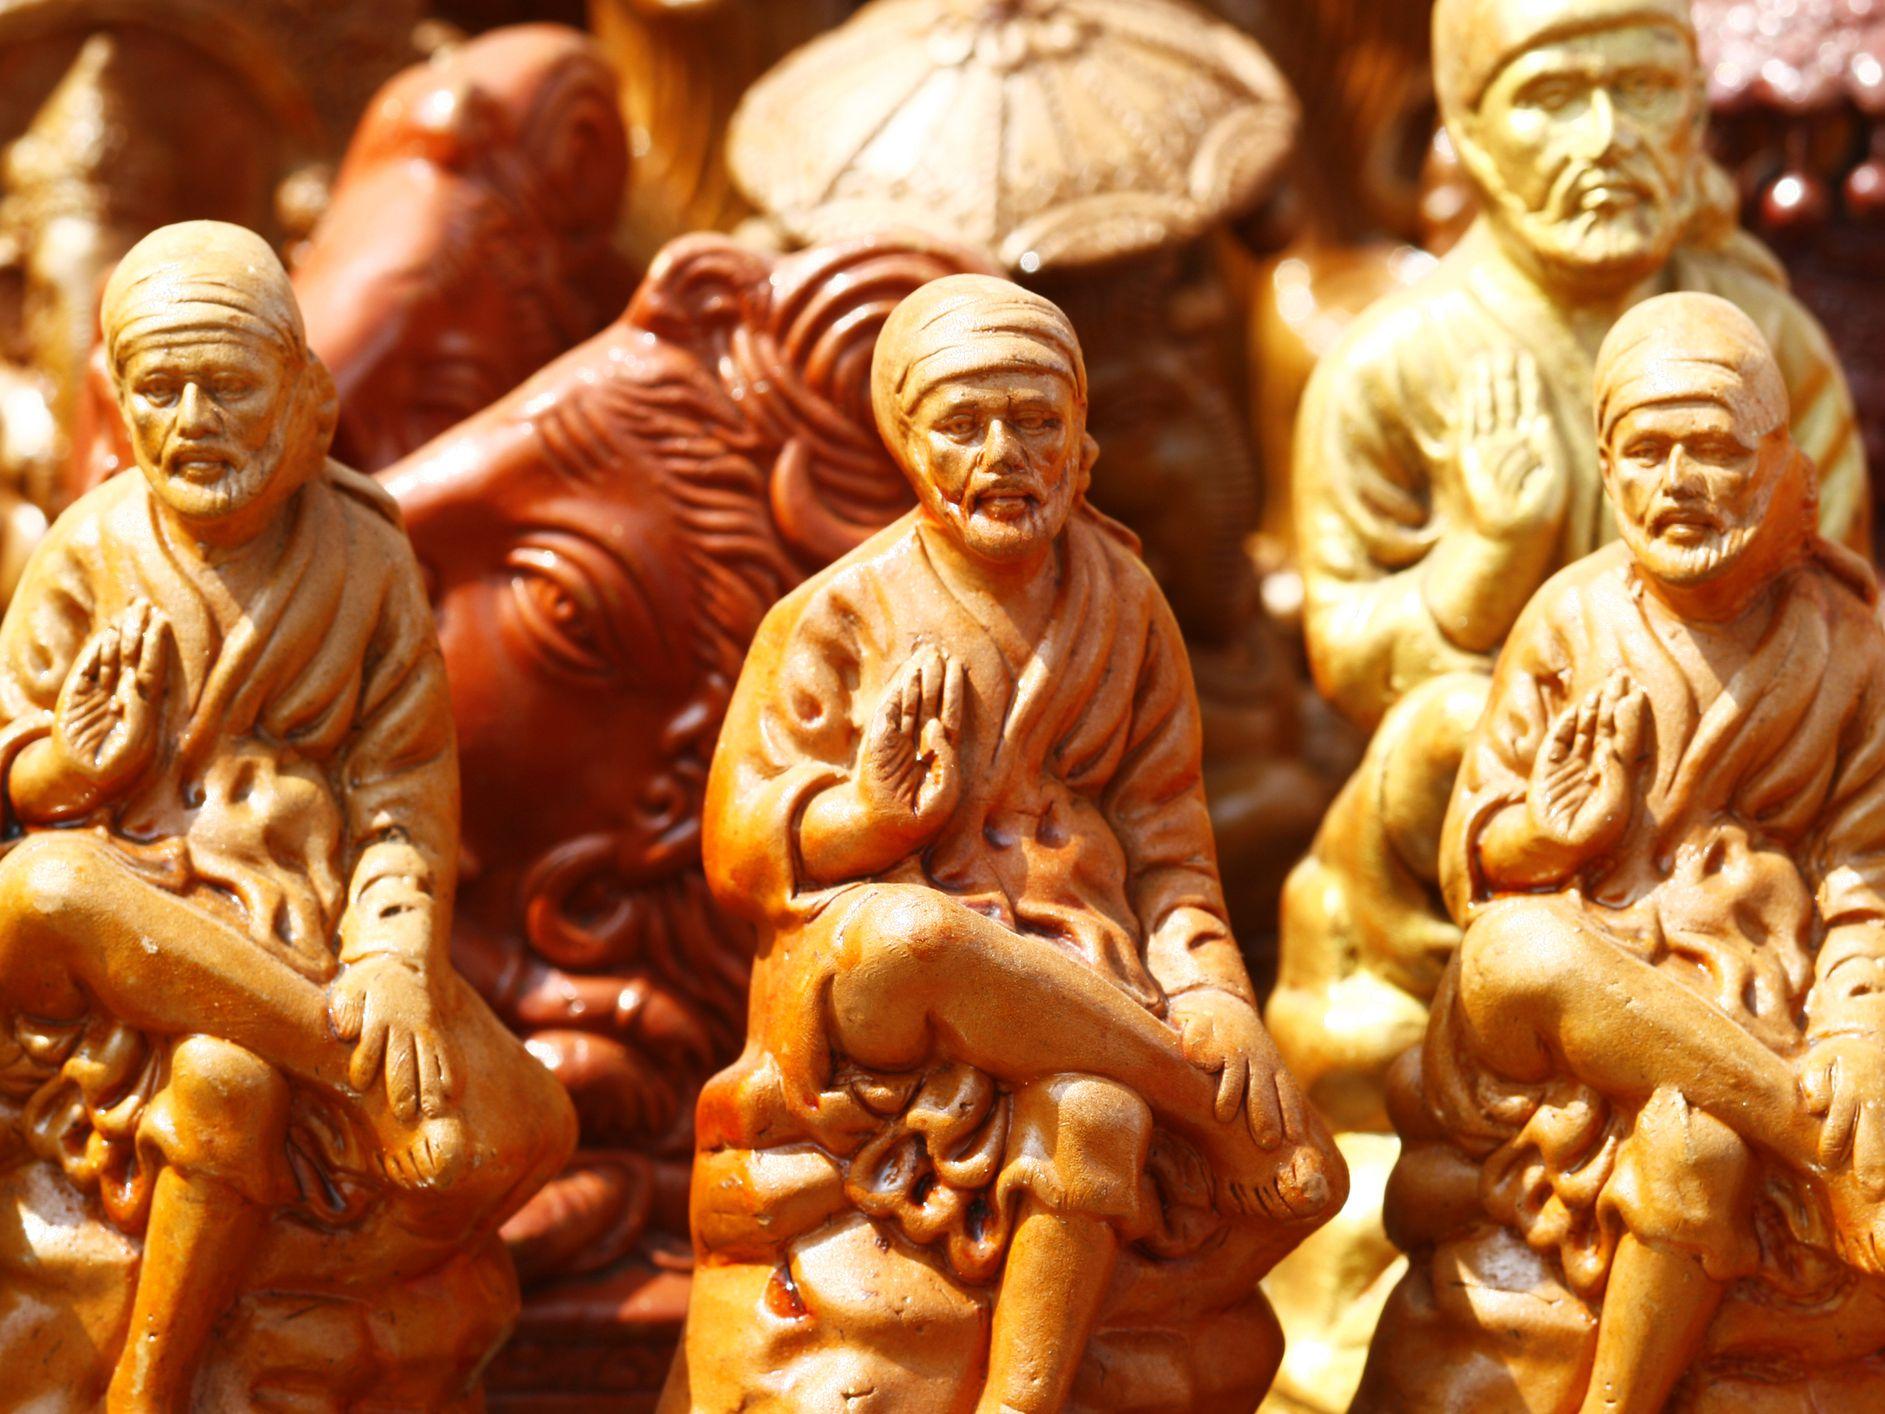 Complete Shirdi Guide to Plan Your Sai Baba Pilgrimage